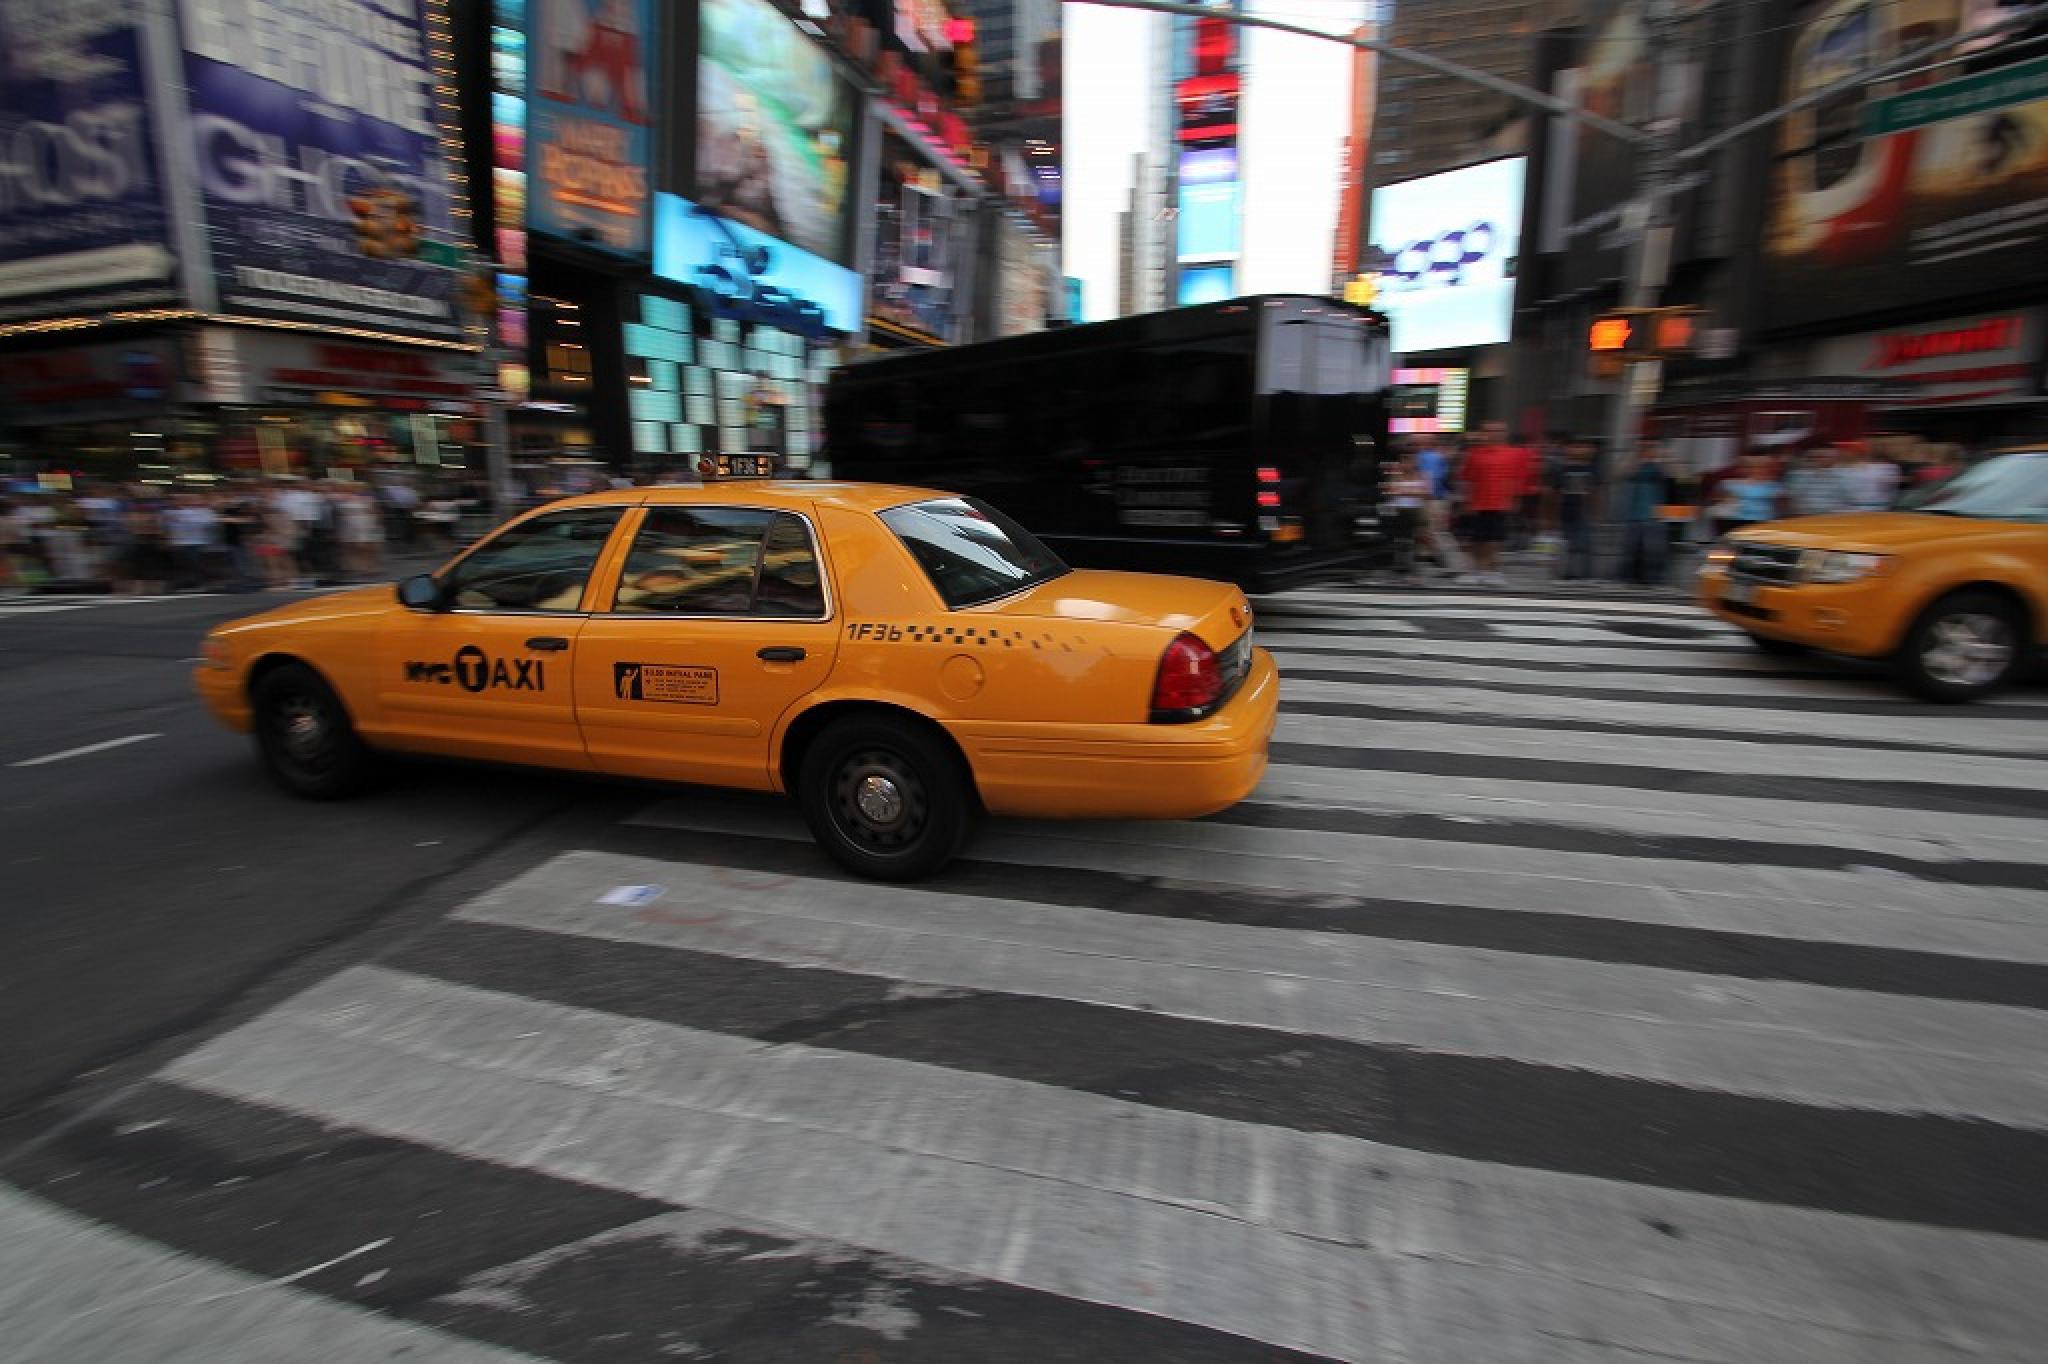 NYC Yellow Cab by soedy✞